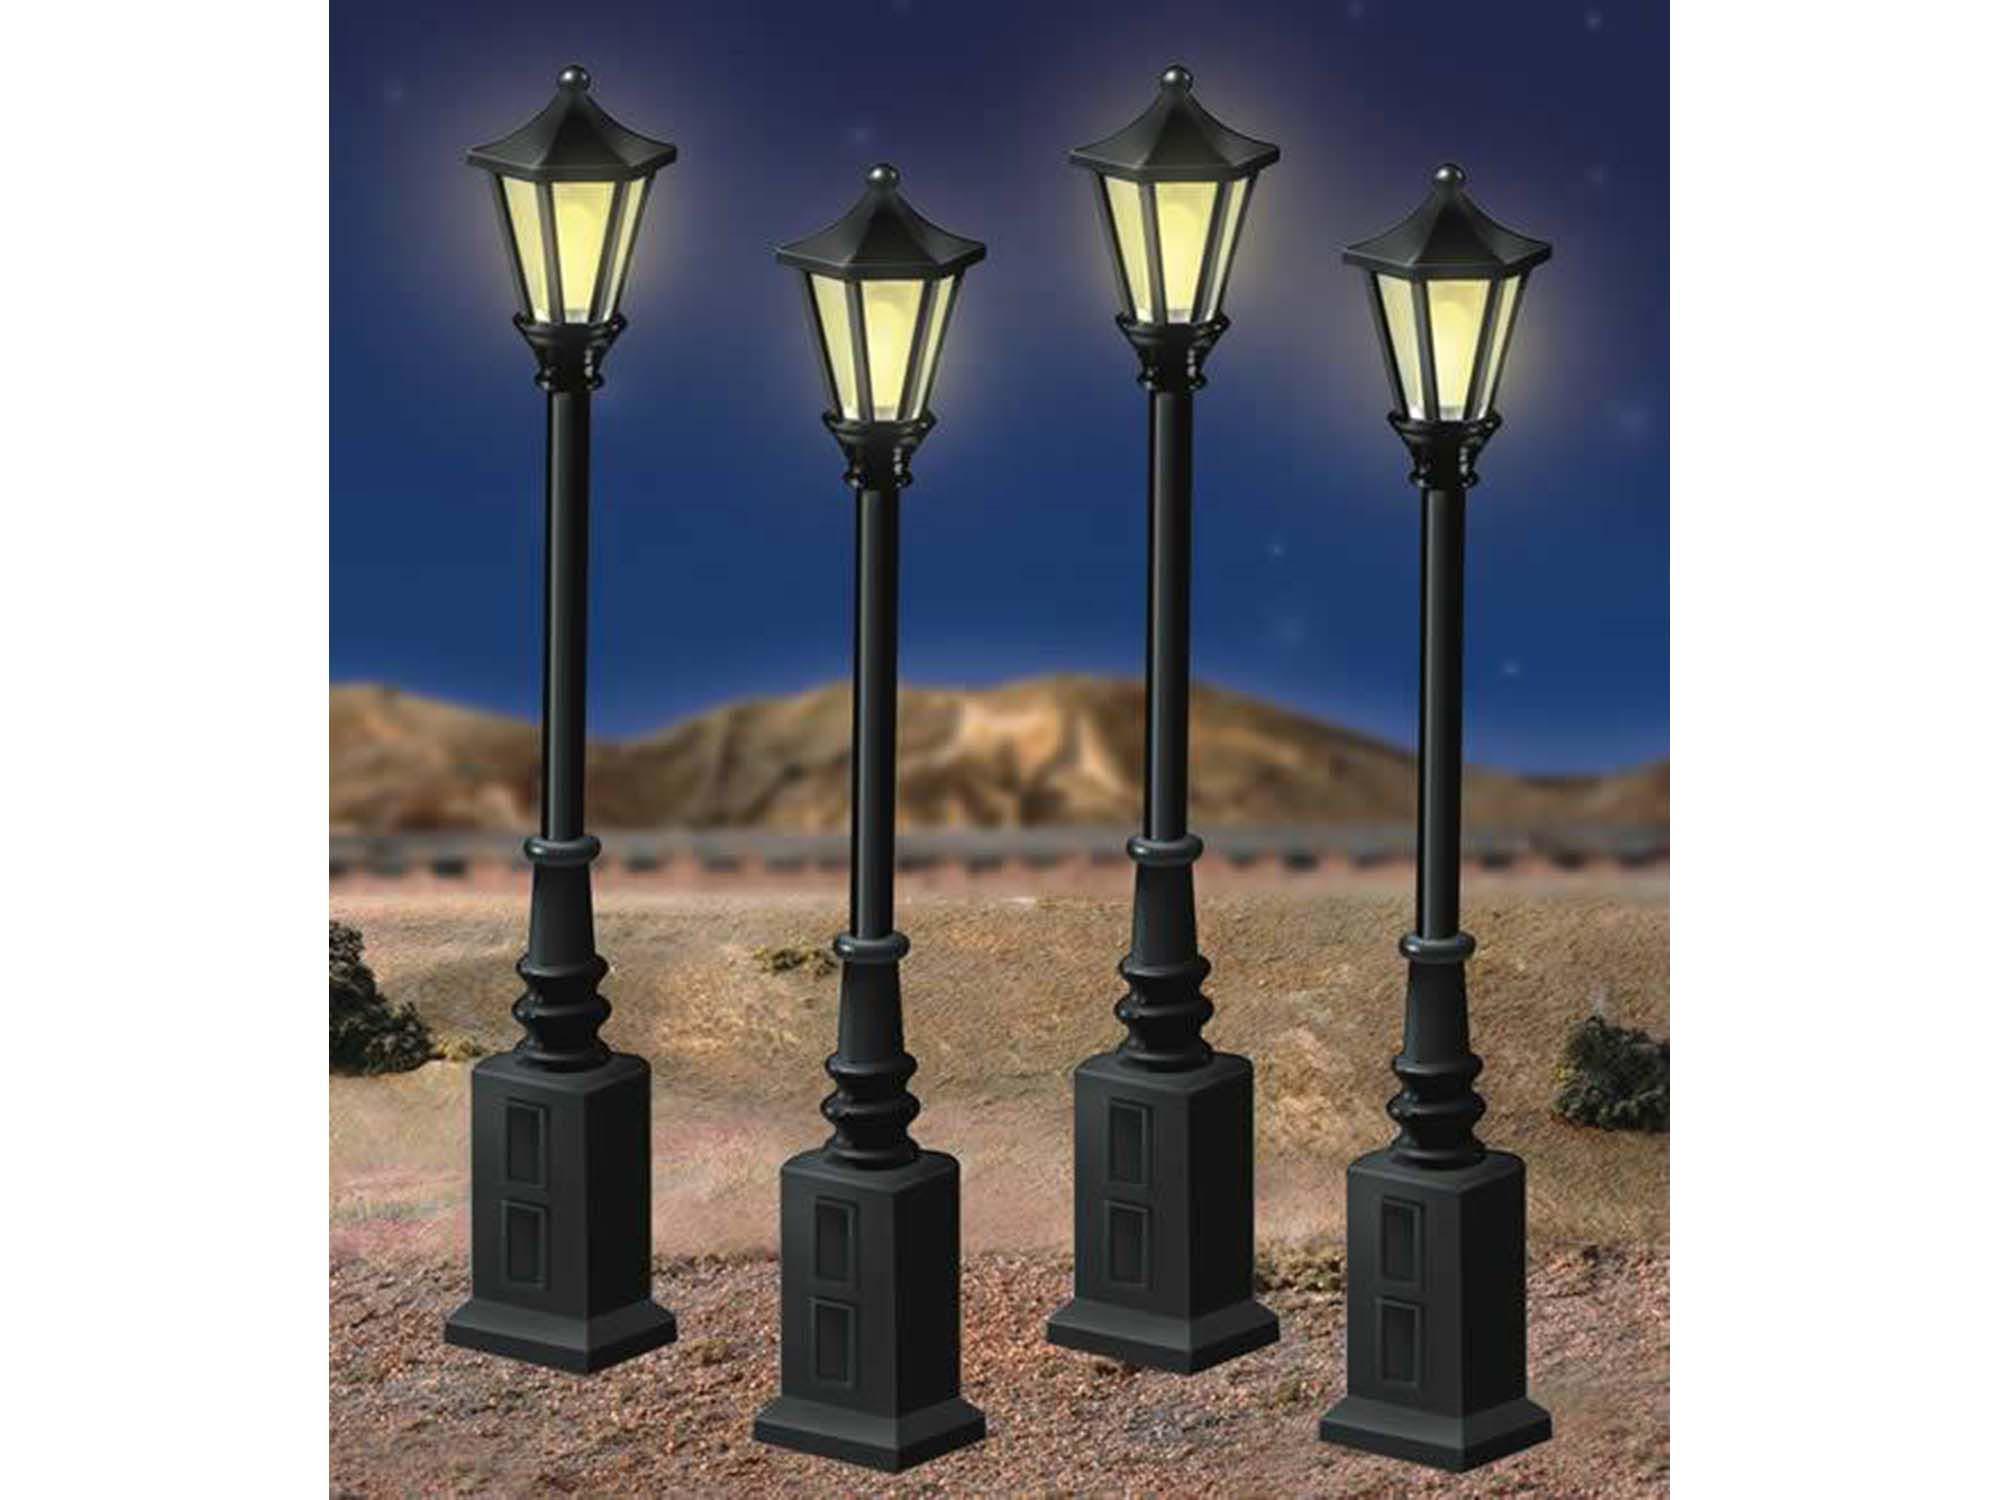 scale street lamps rh lionel com Lionel Lights Lionel Crossing Signal